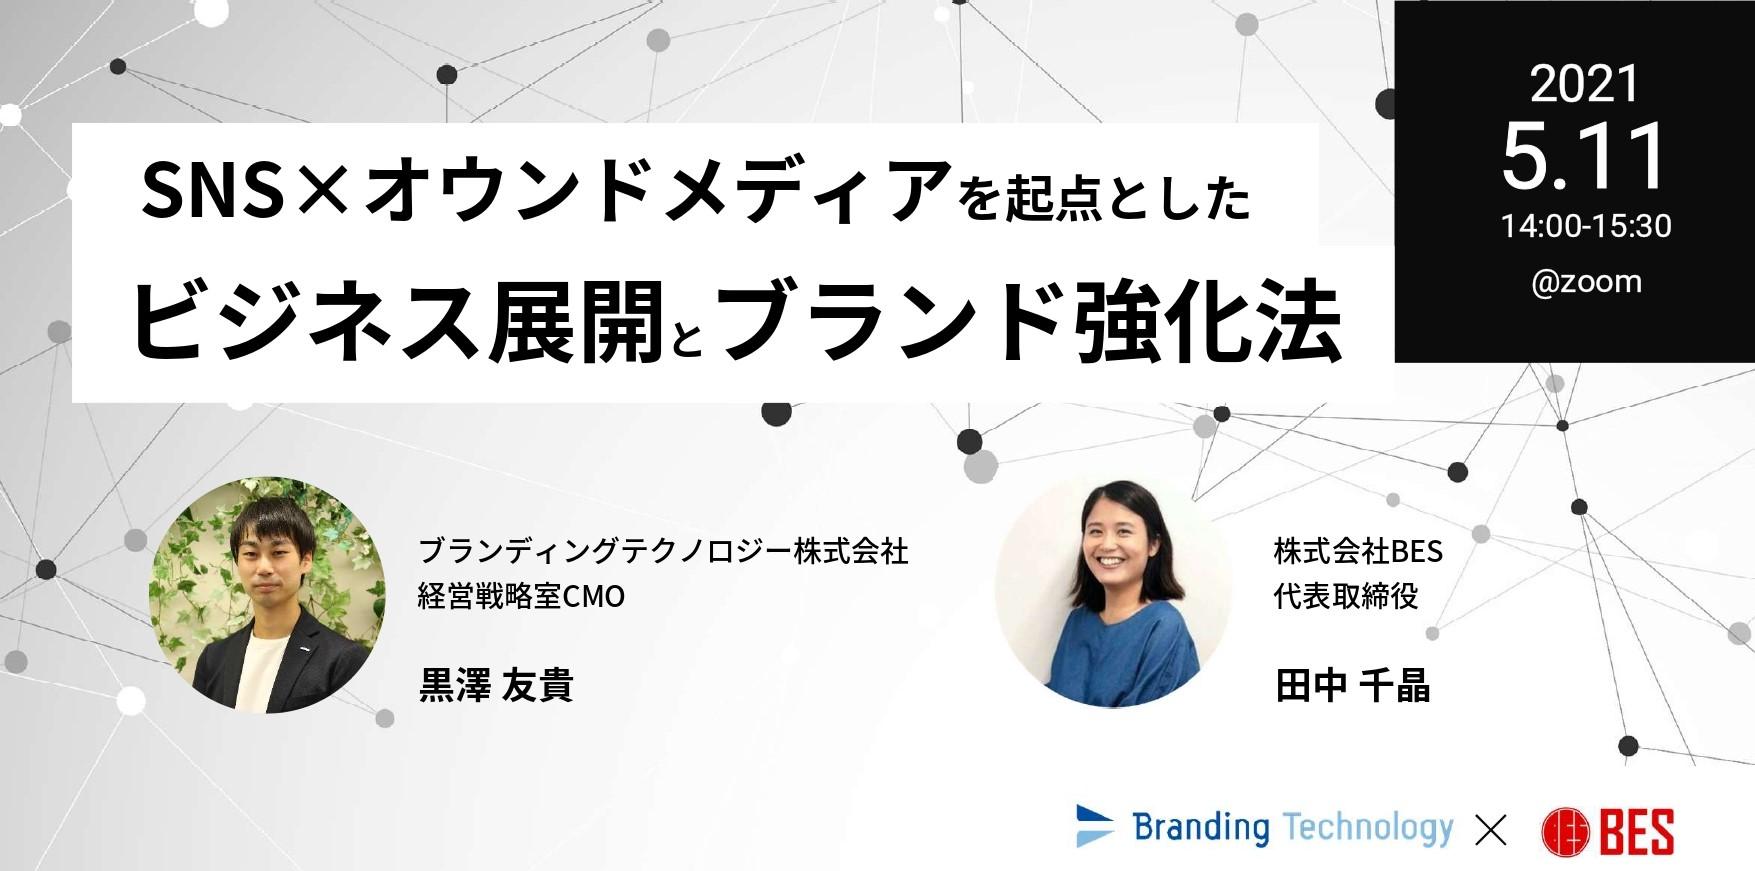 「SNS×オウンドメディア」を起点としたビジネス展開とブランド強化法(BES共催)